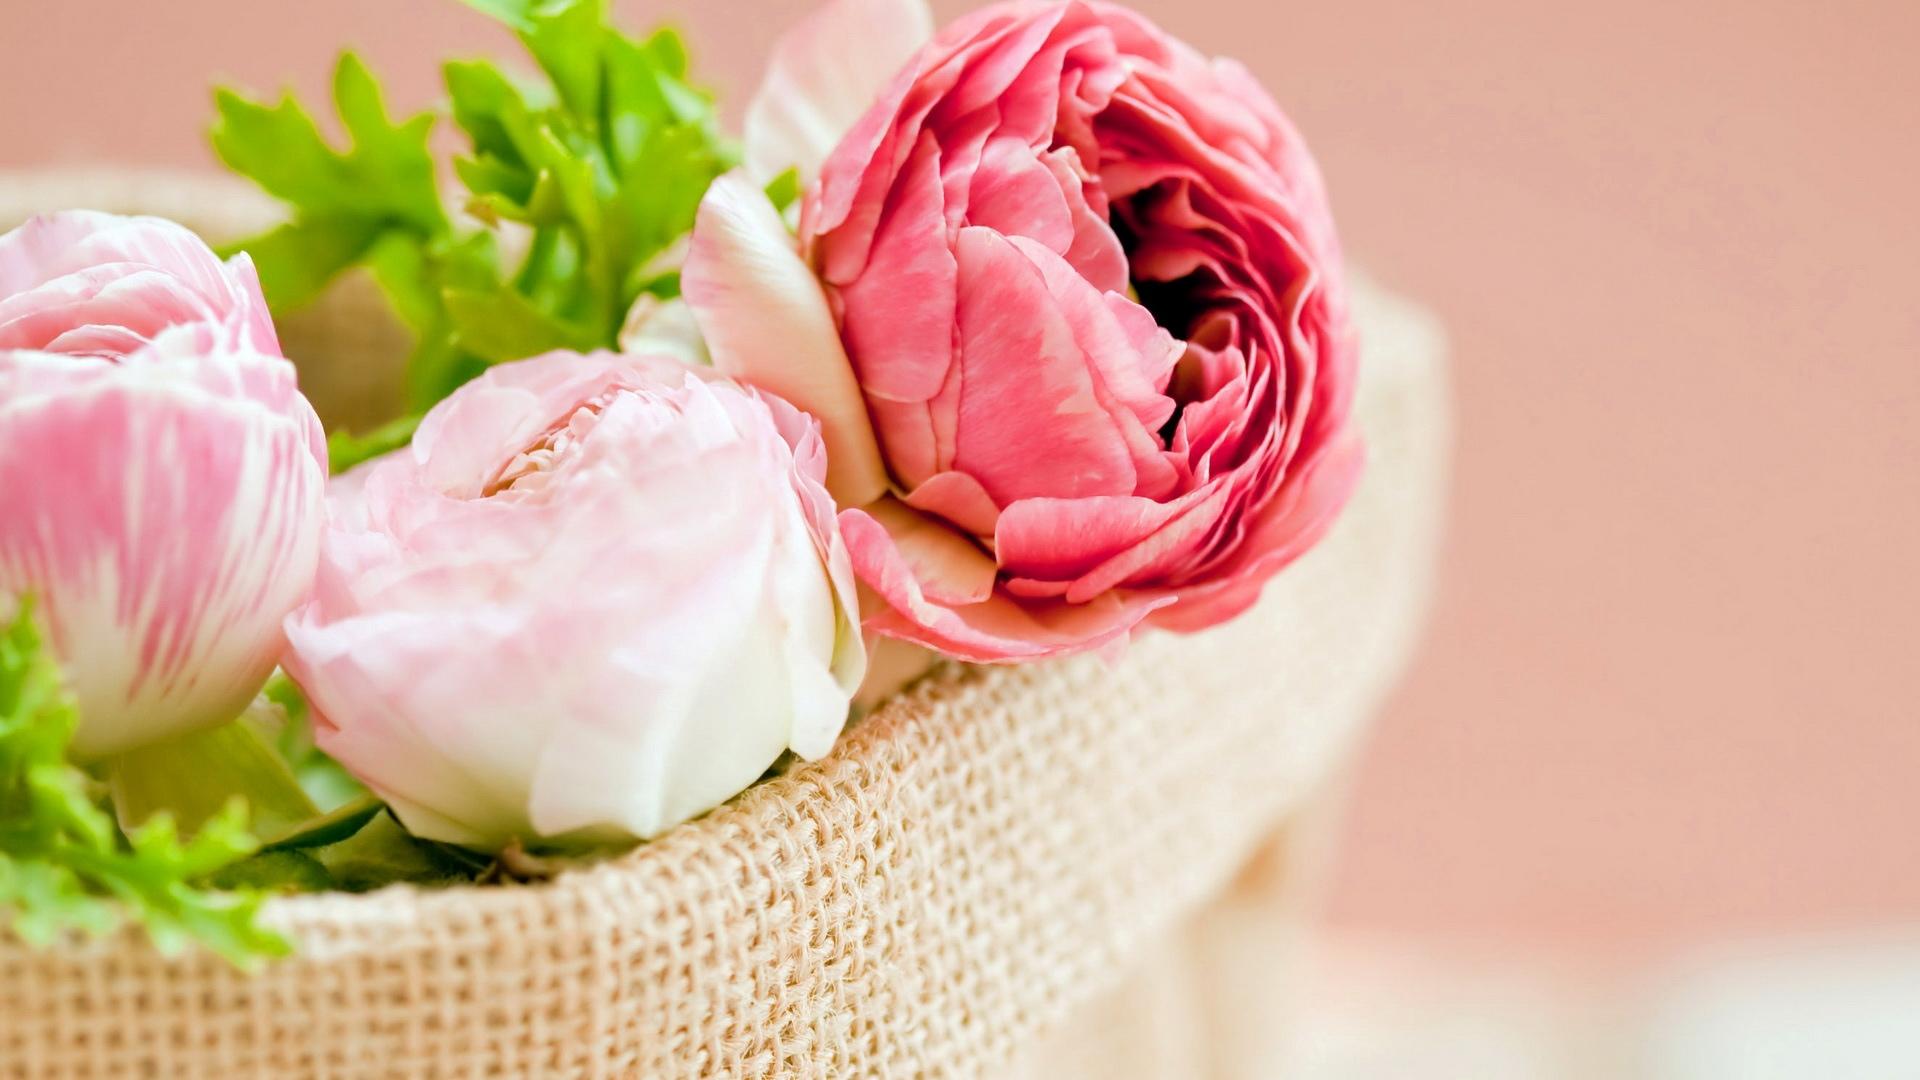 camellias desktop wallpaper